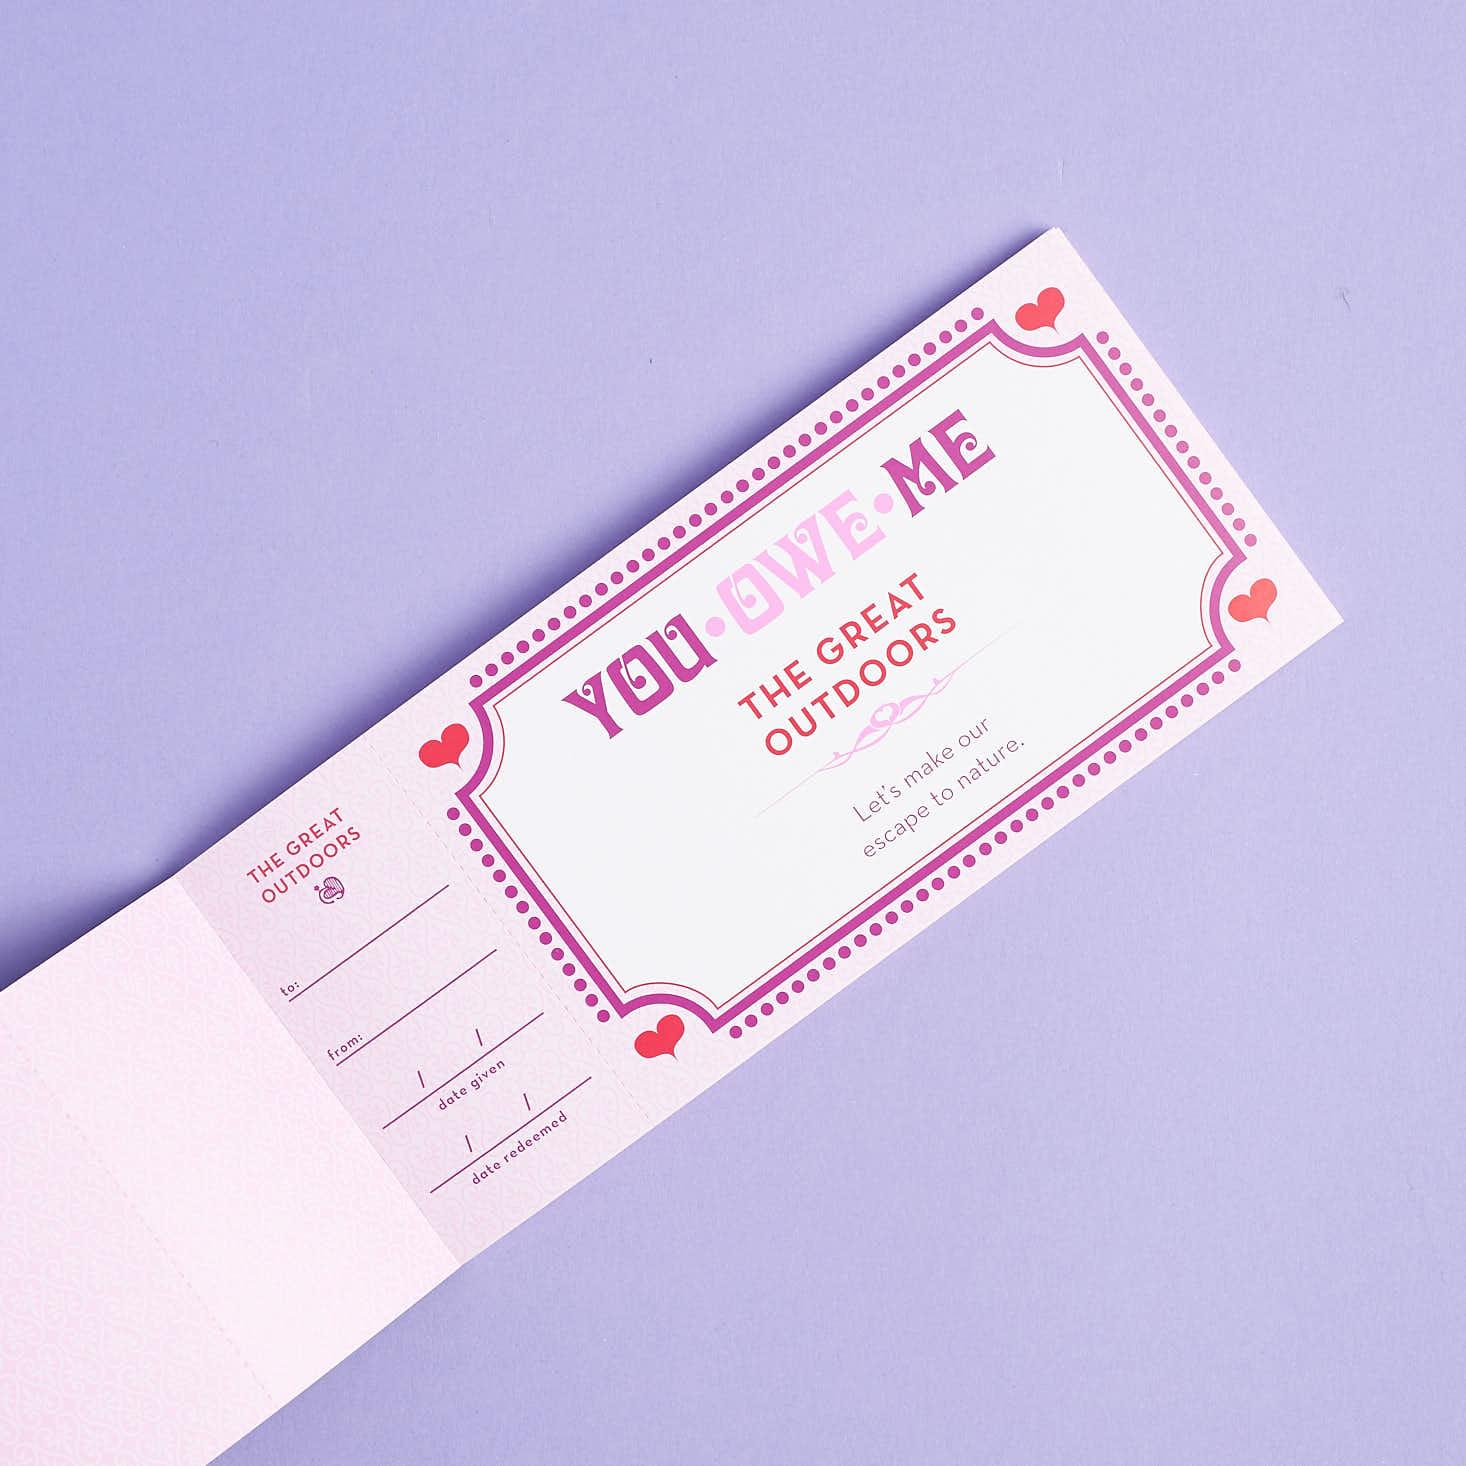 Modern-Love-Box-March-2018-0014-733x733@2x